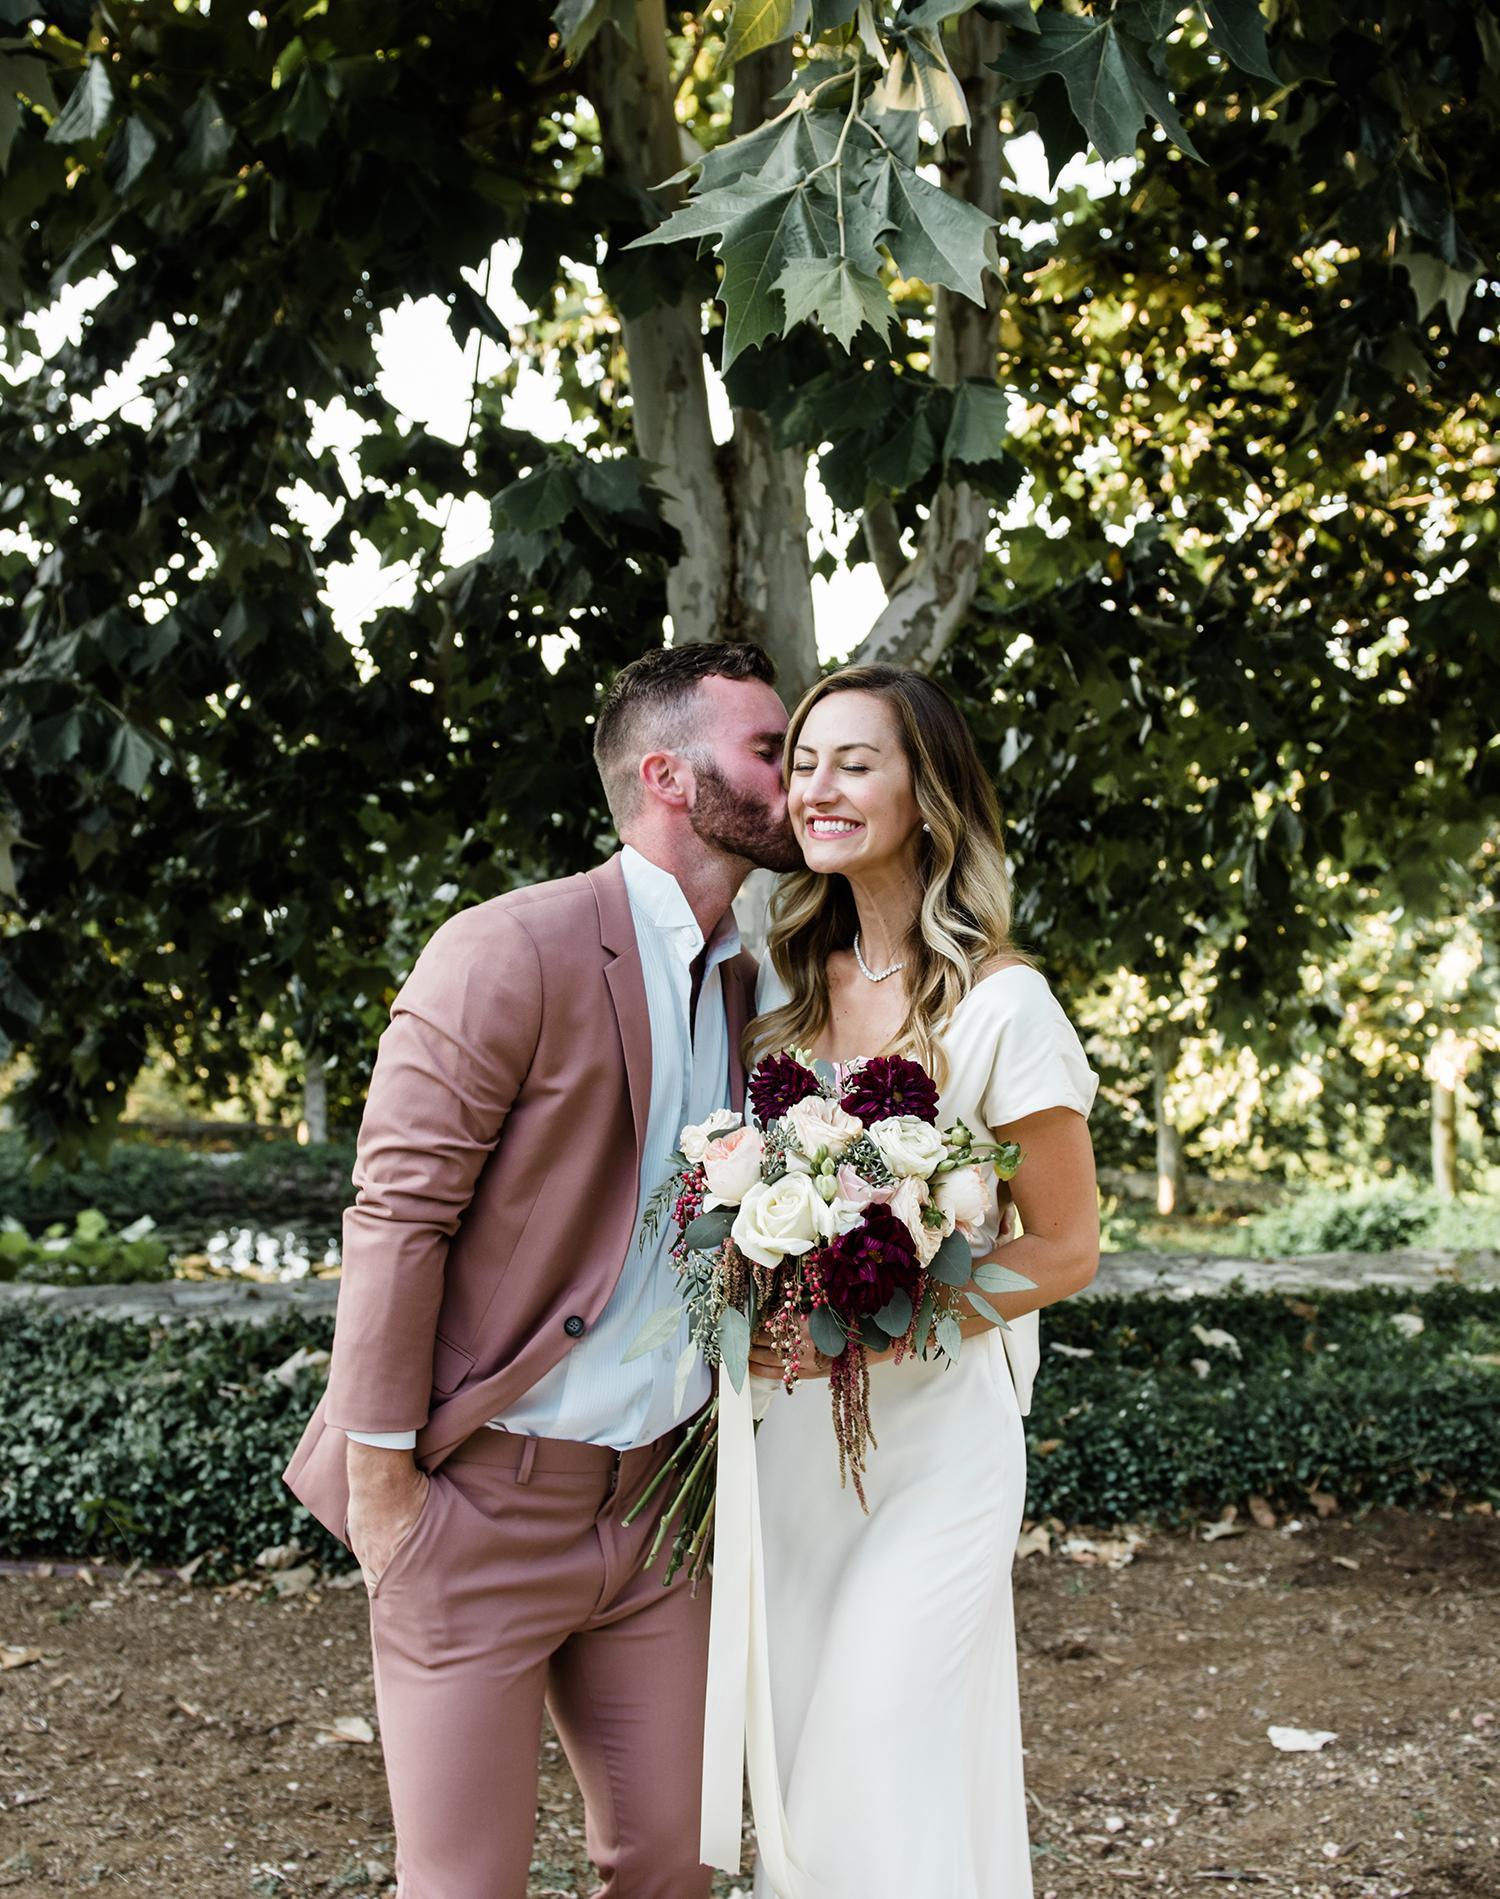 livvyland-blog-olivia-watson-wedding-villa-del-lago-austin-texas-fall-blush-burgundy-classic-romantic-1